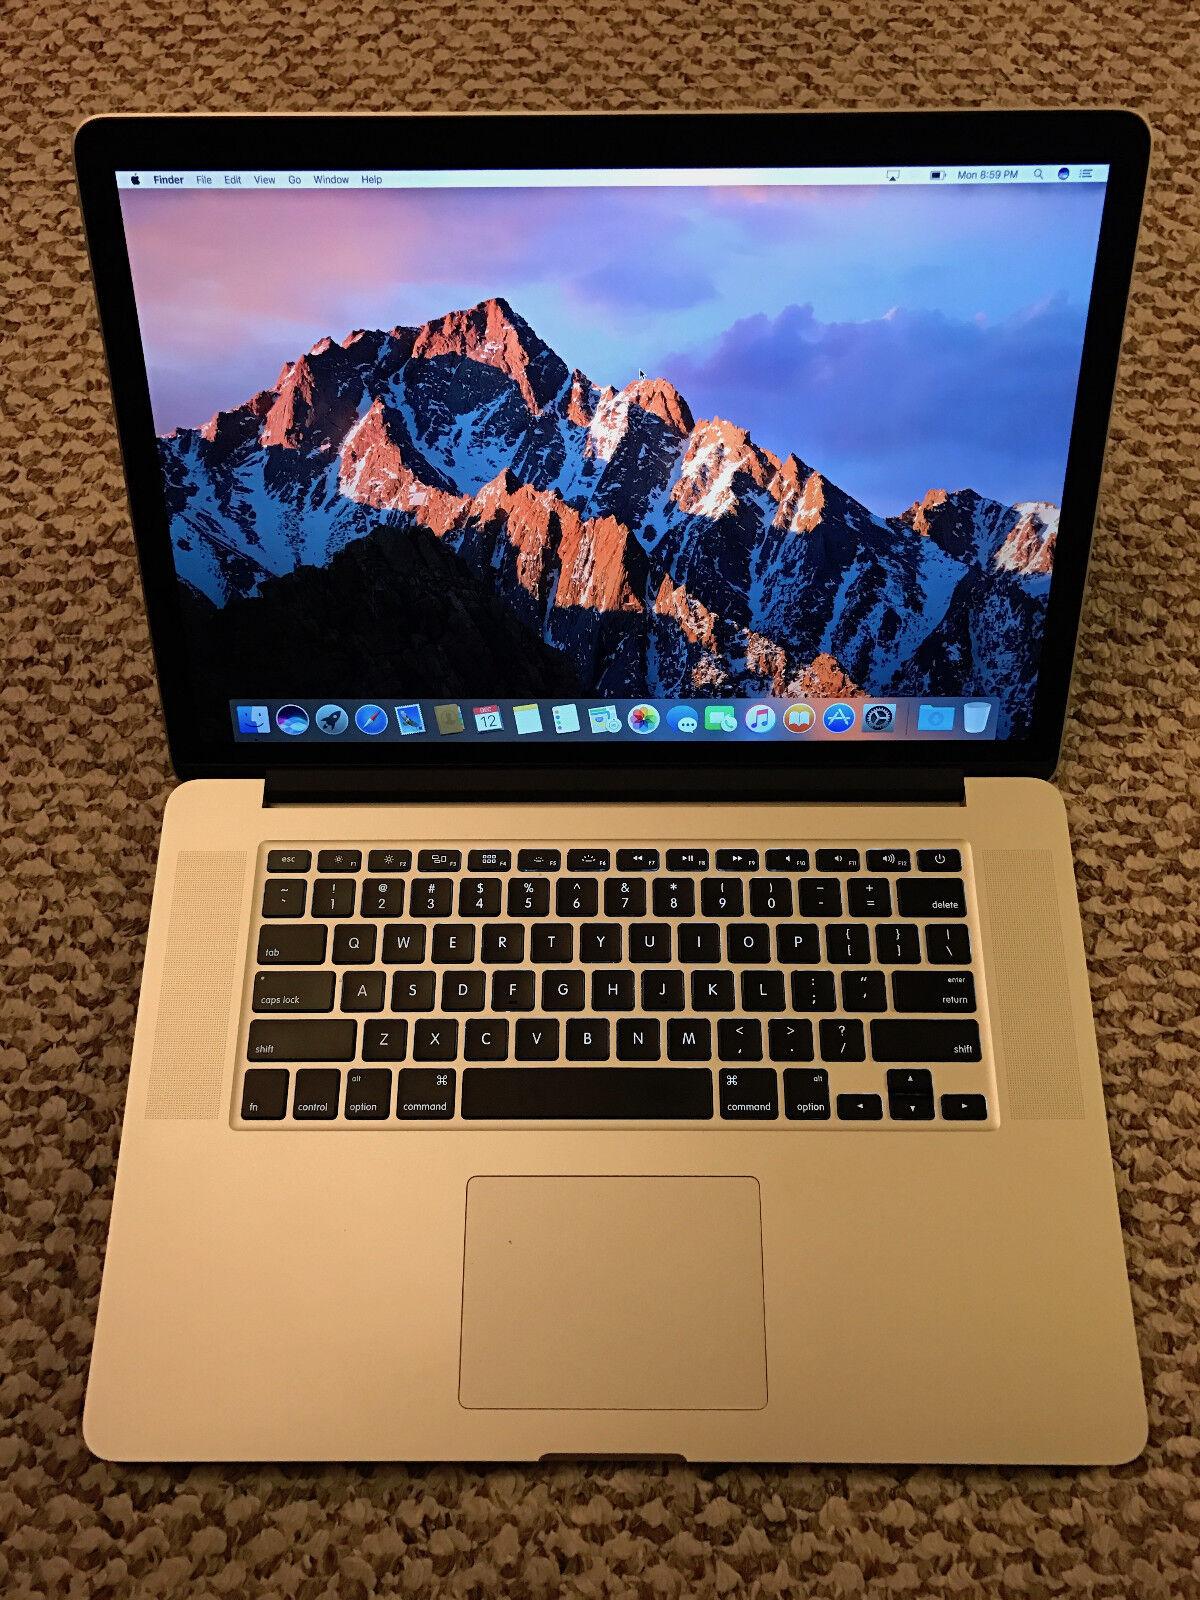 Apple RETINA Macbook Pro 15in 2015 AMD, new body, Applecare!